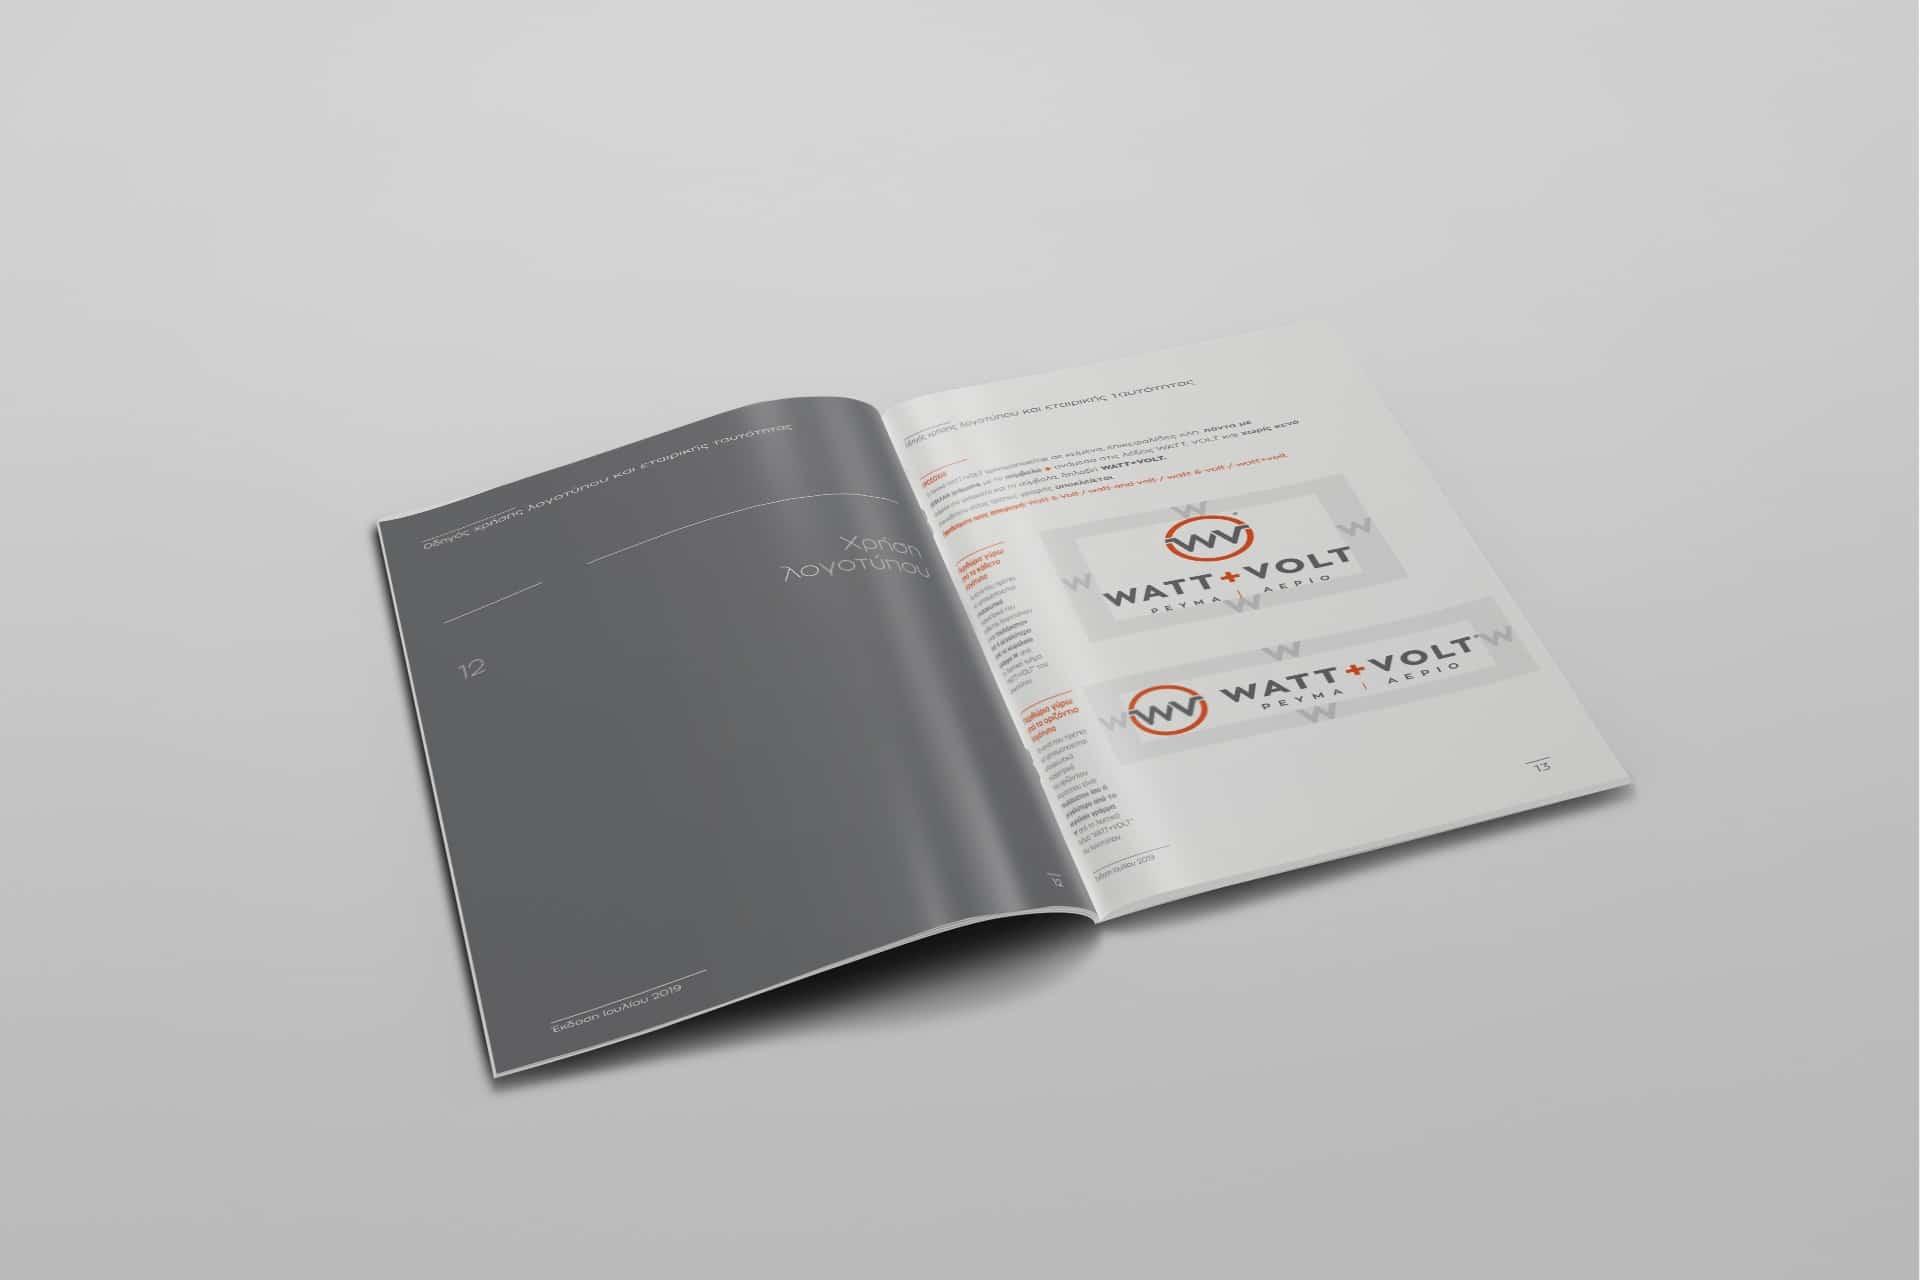 WATT+VOLT Brand Guidelines Γραφίστας Σπύρος Ηλιόπουλος